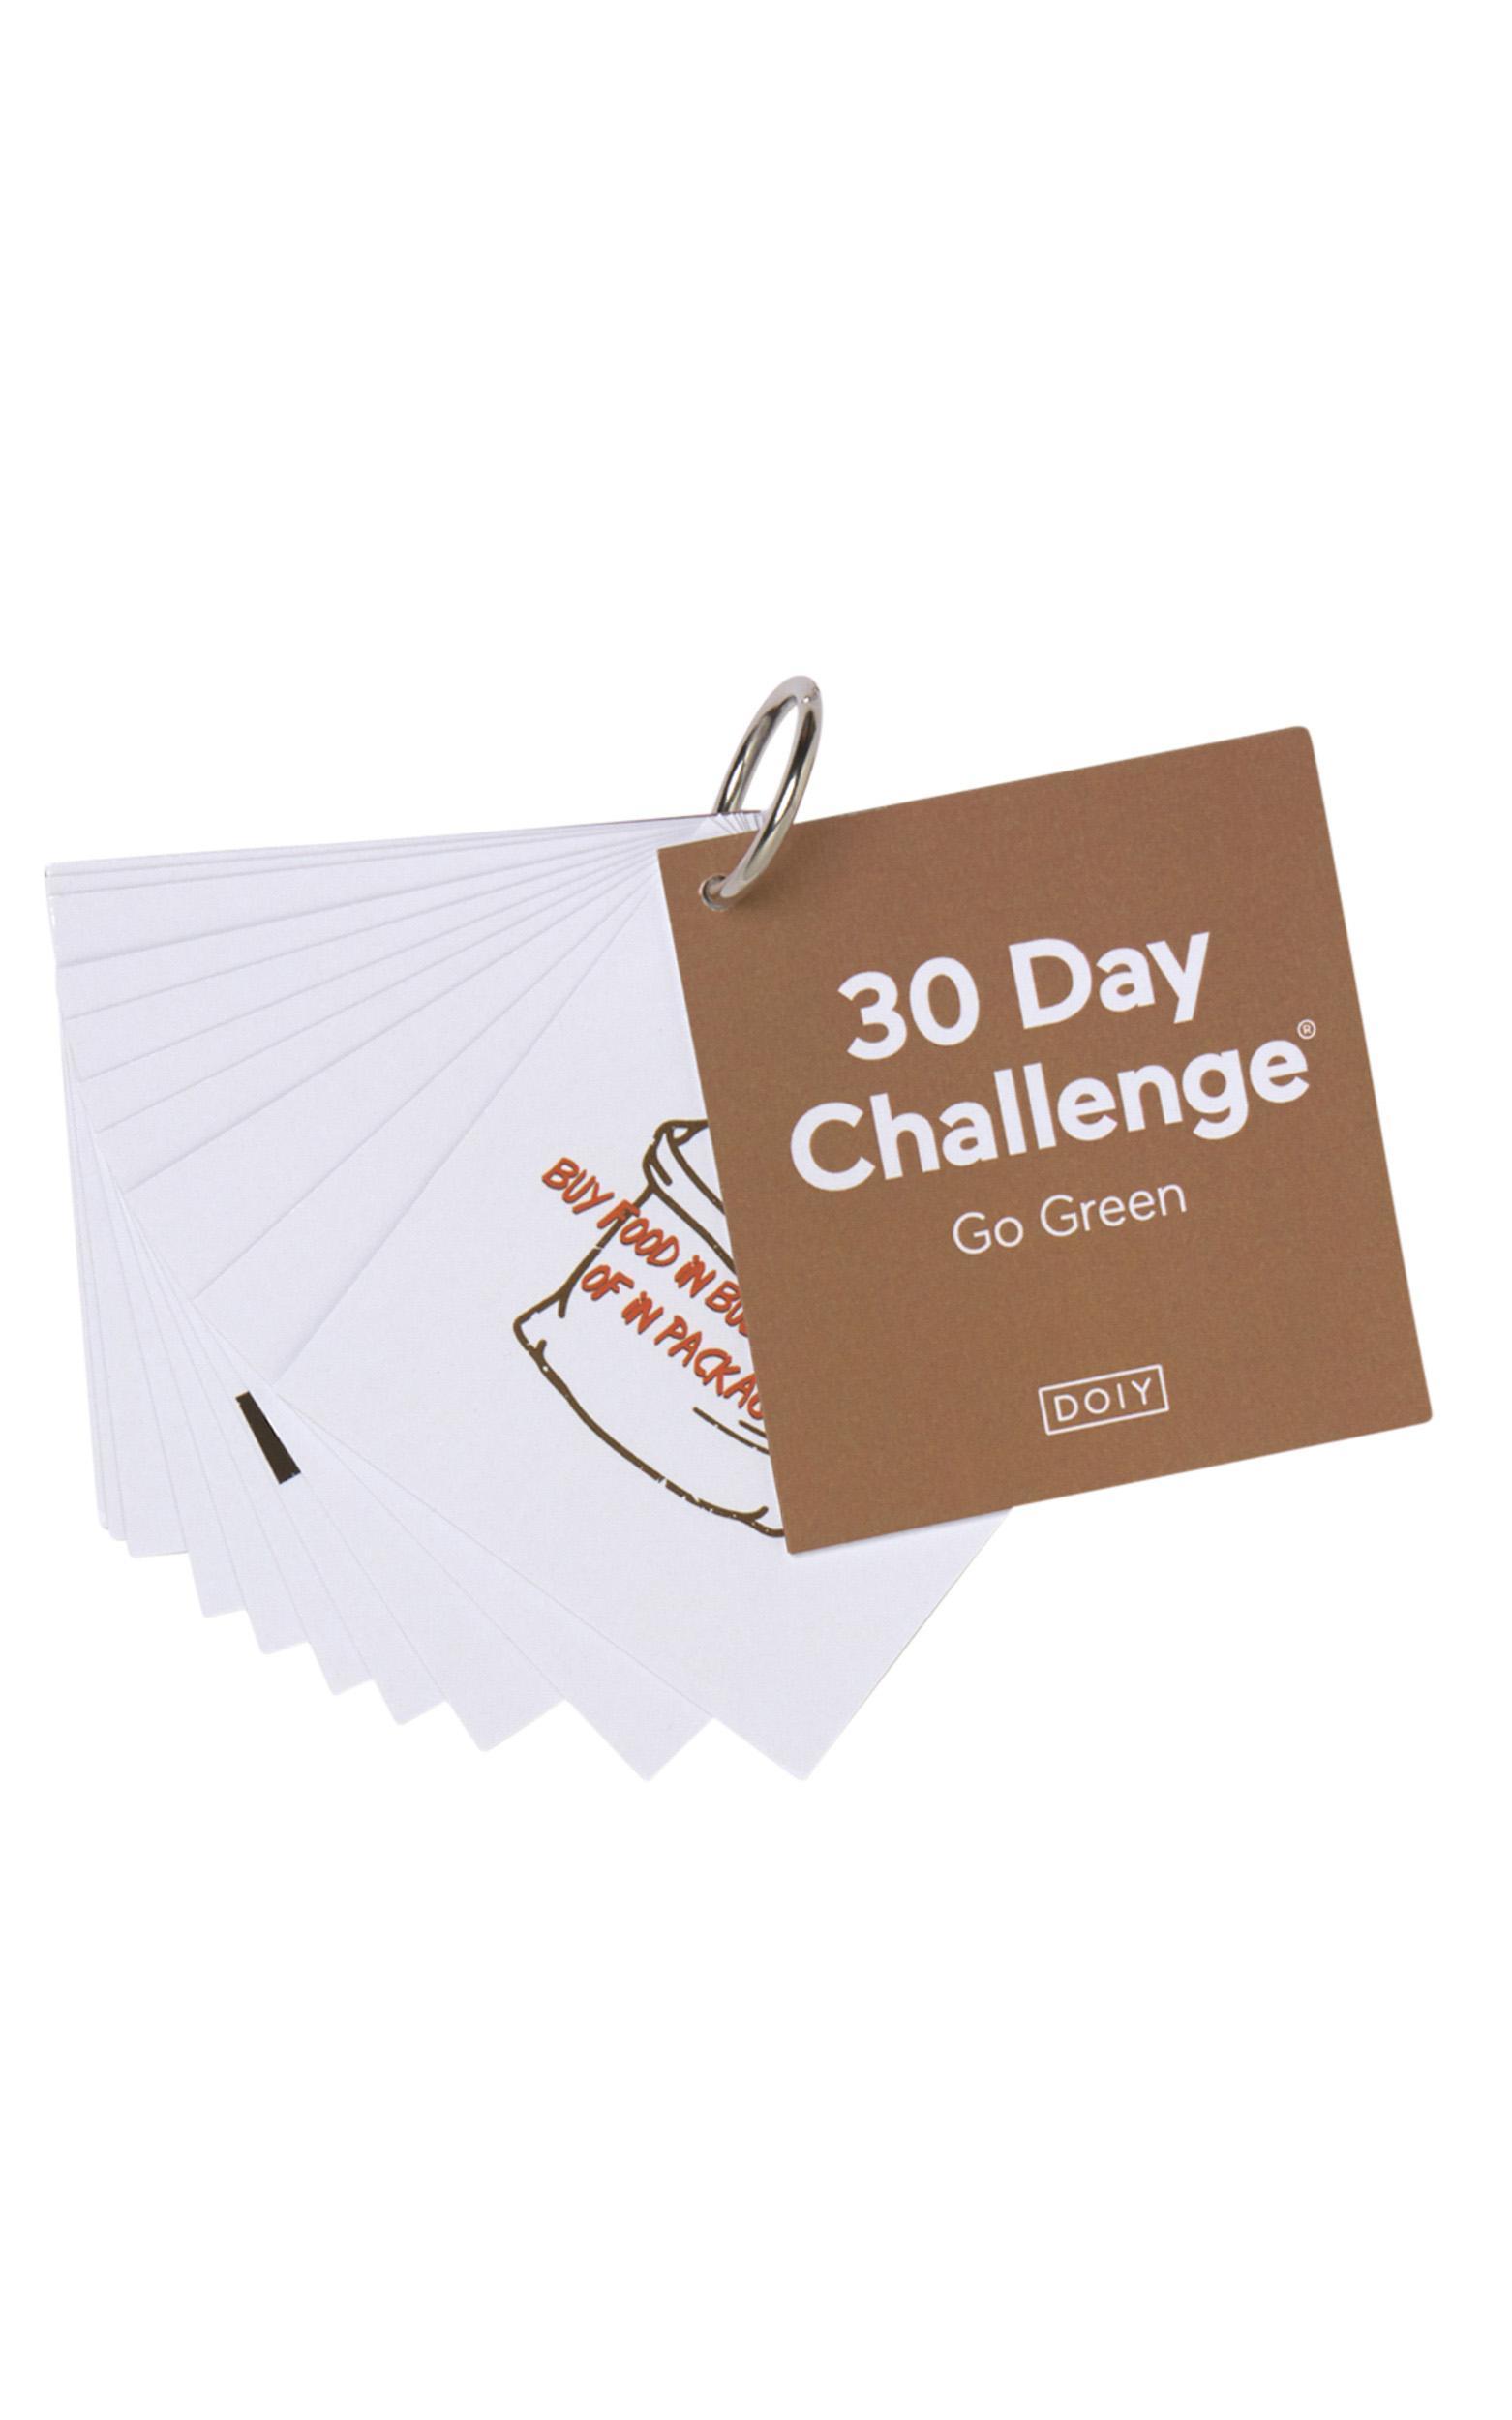 Doiy: 30 Day Challenge - Go Green , , hi-res image number null